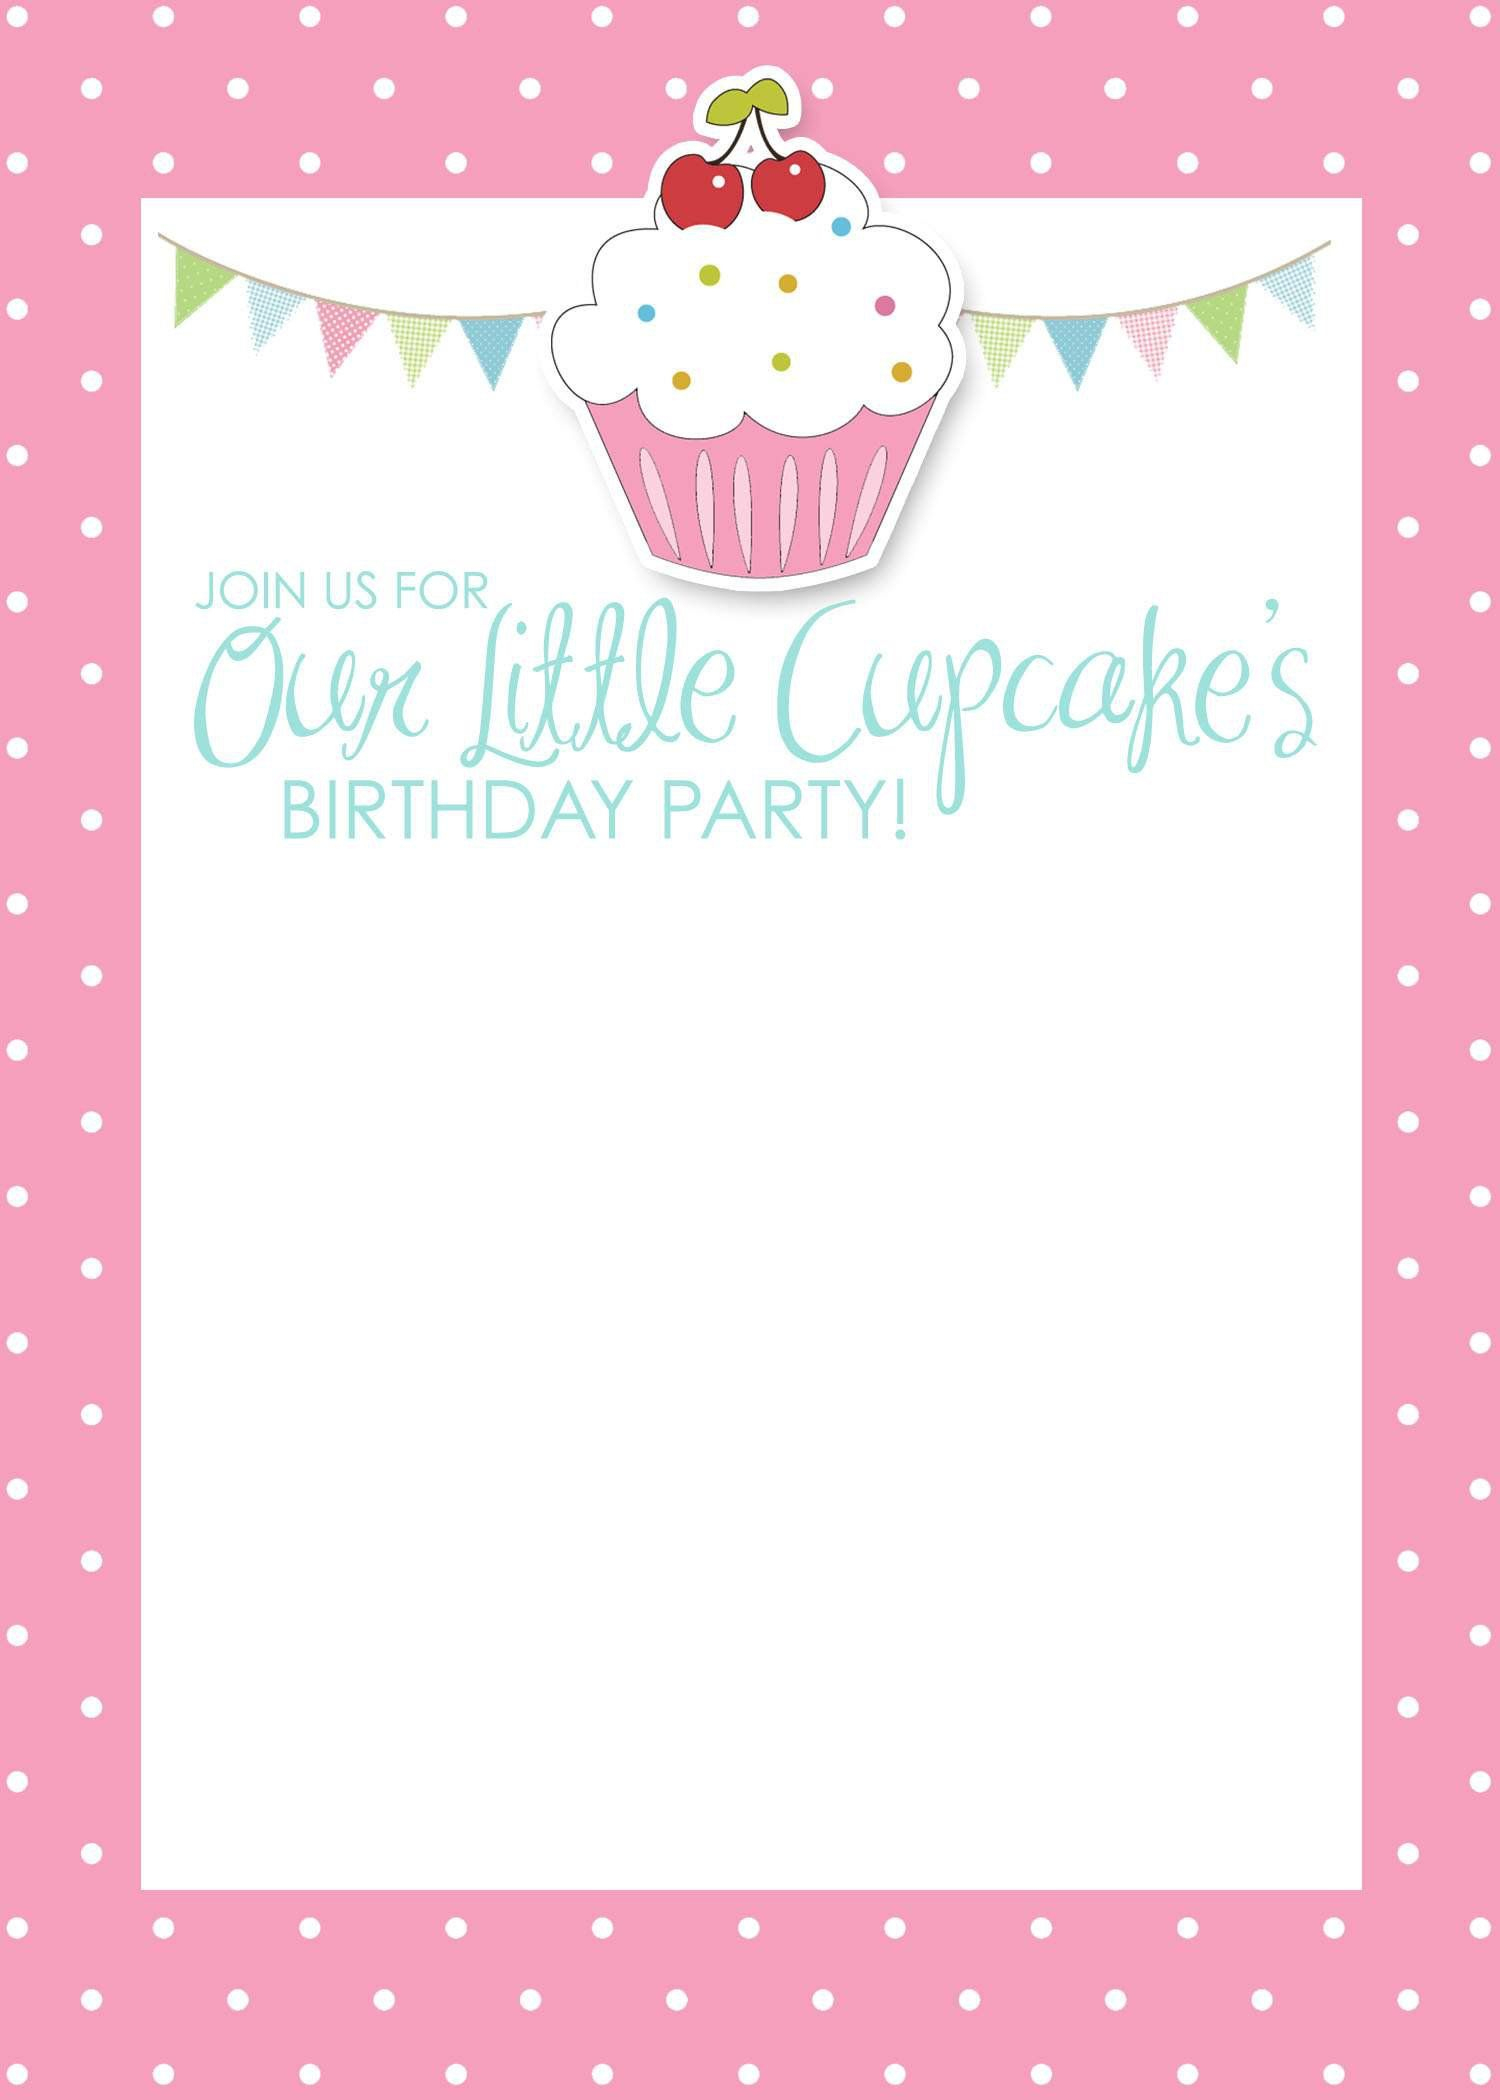 Birthday-Invitation-Card-Template-Free | Birthday Invitations - Free Printable Birthday Invitation Cards Templates